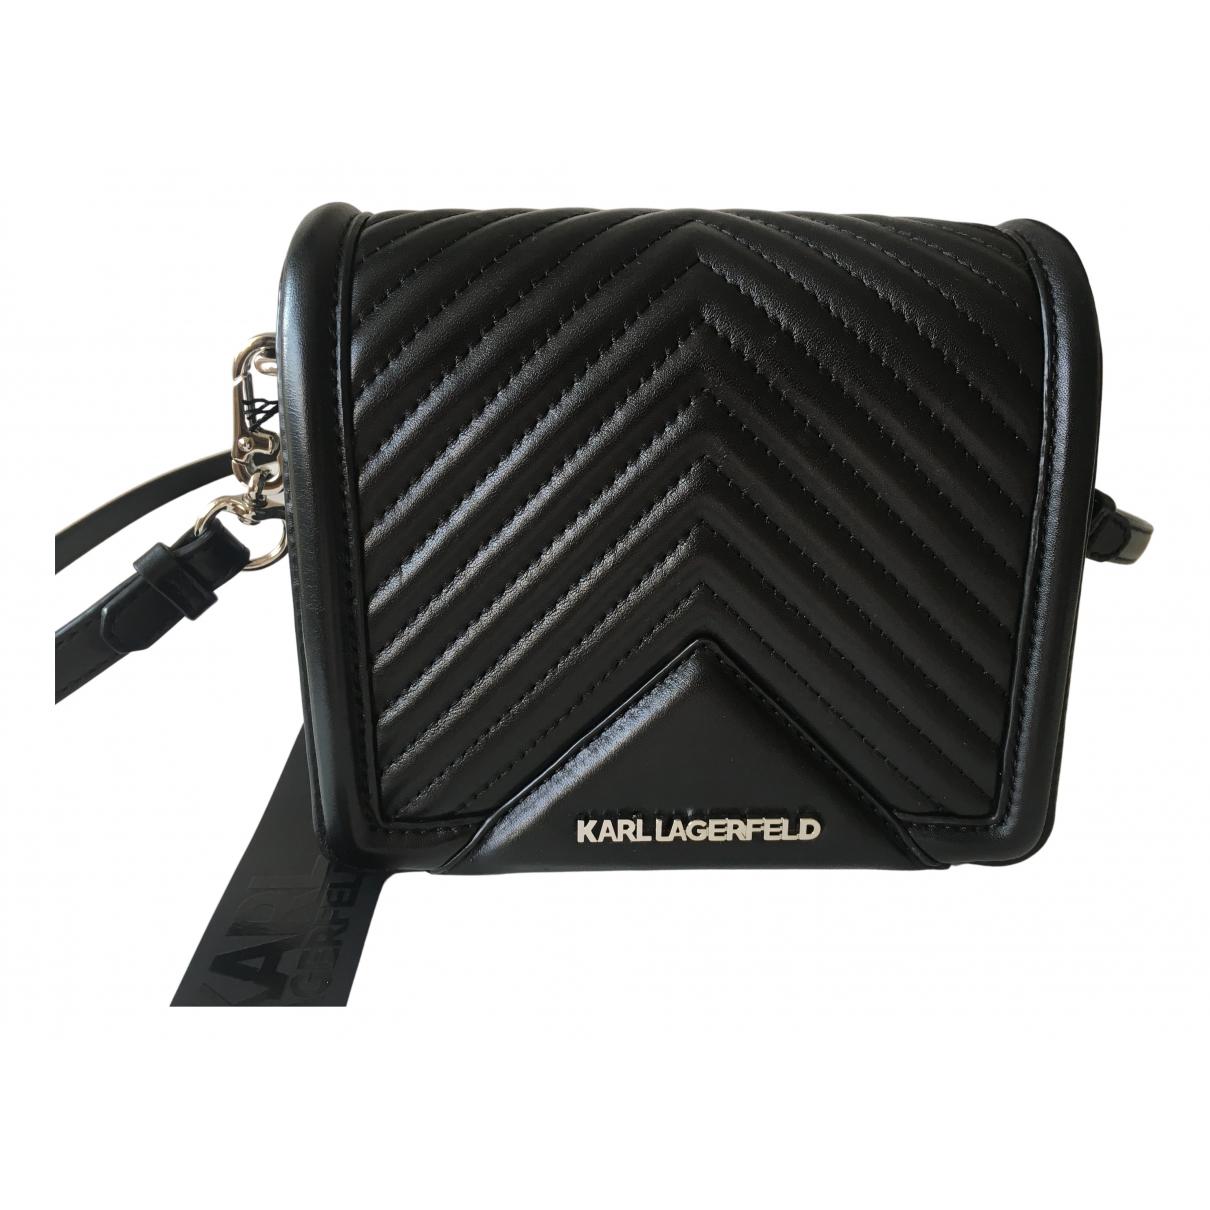 Karl Lagerfeld N Black Leather handbag for Women N